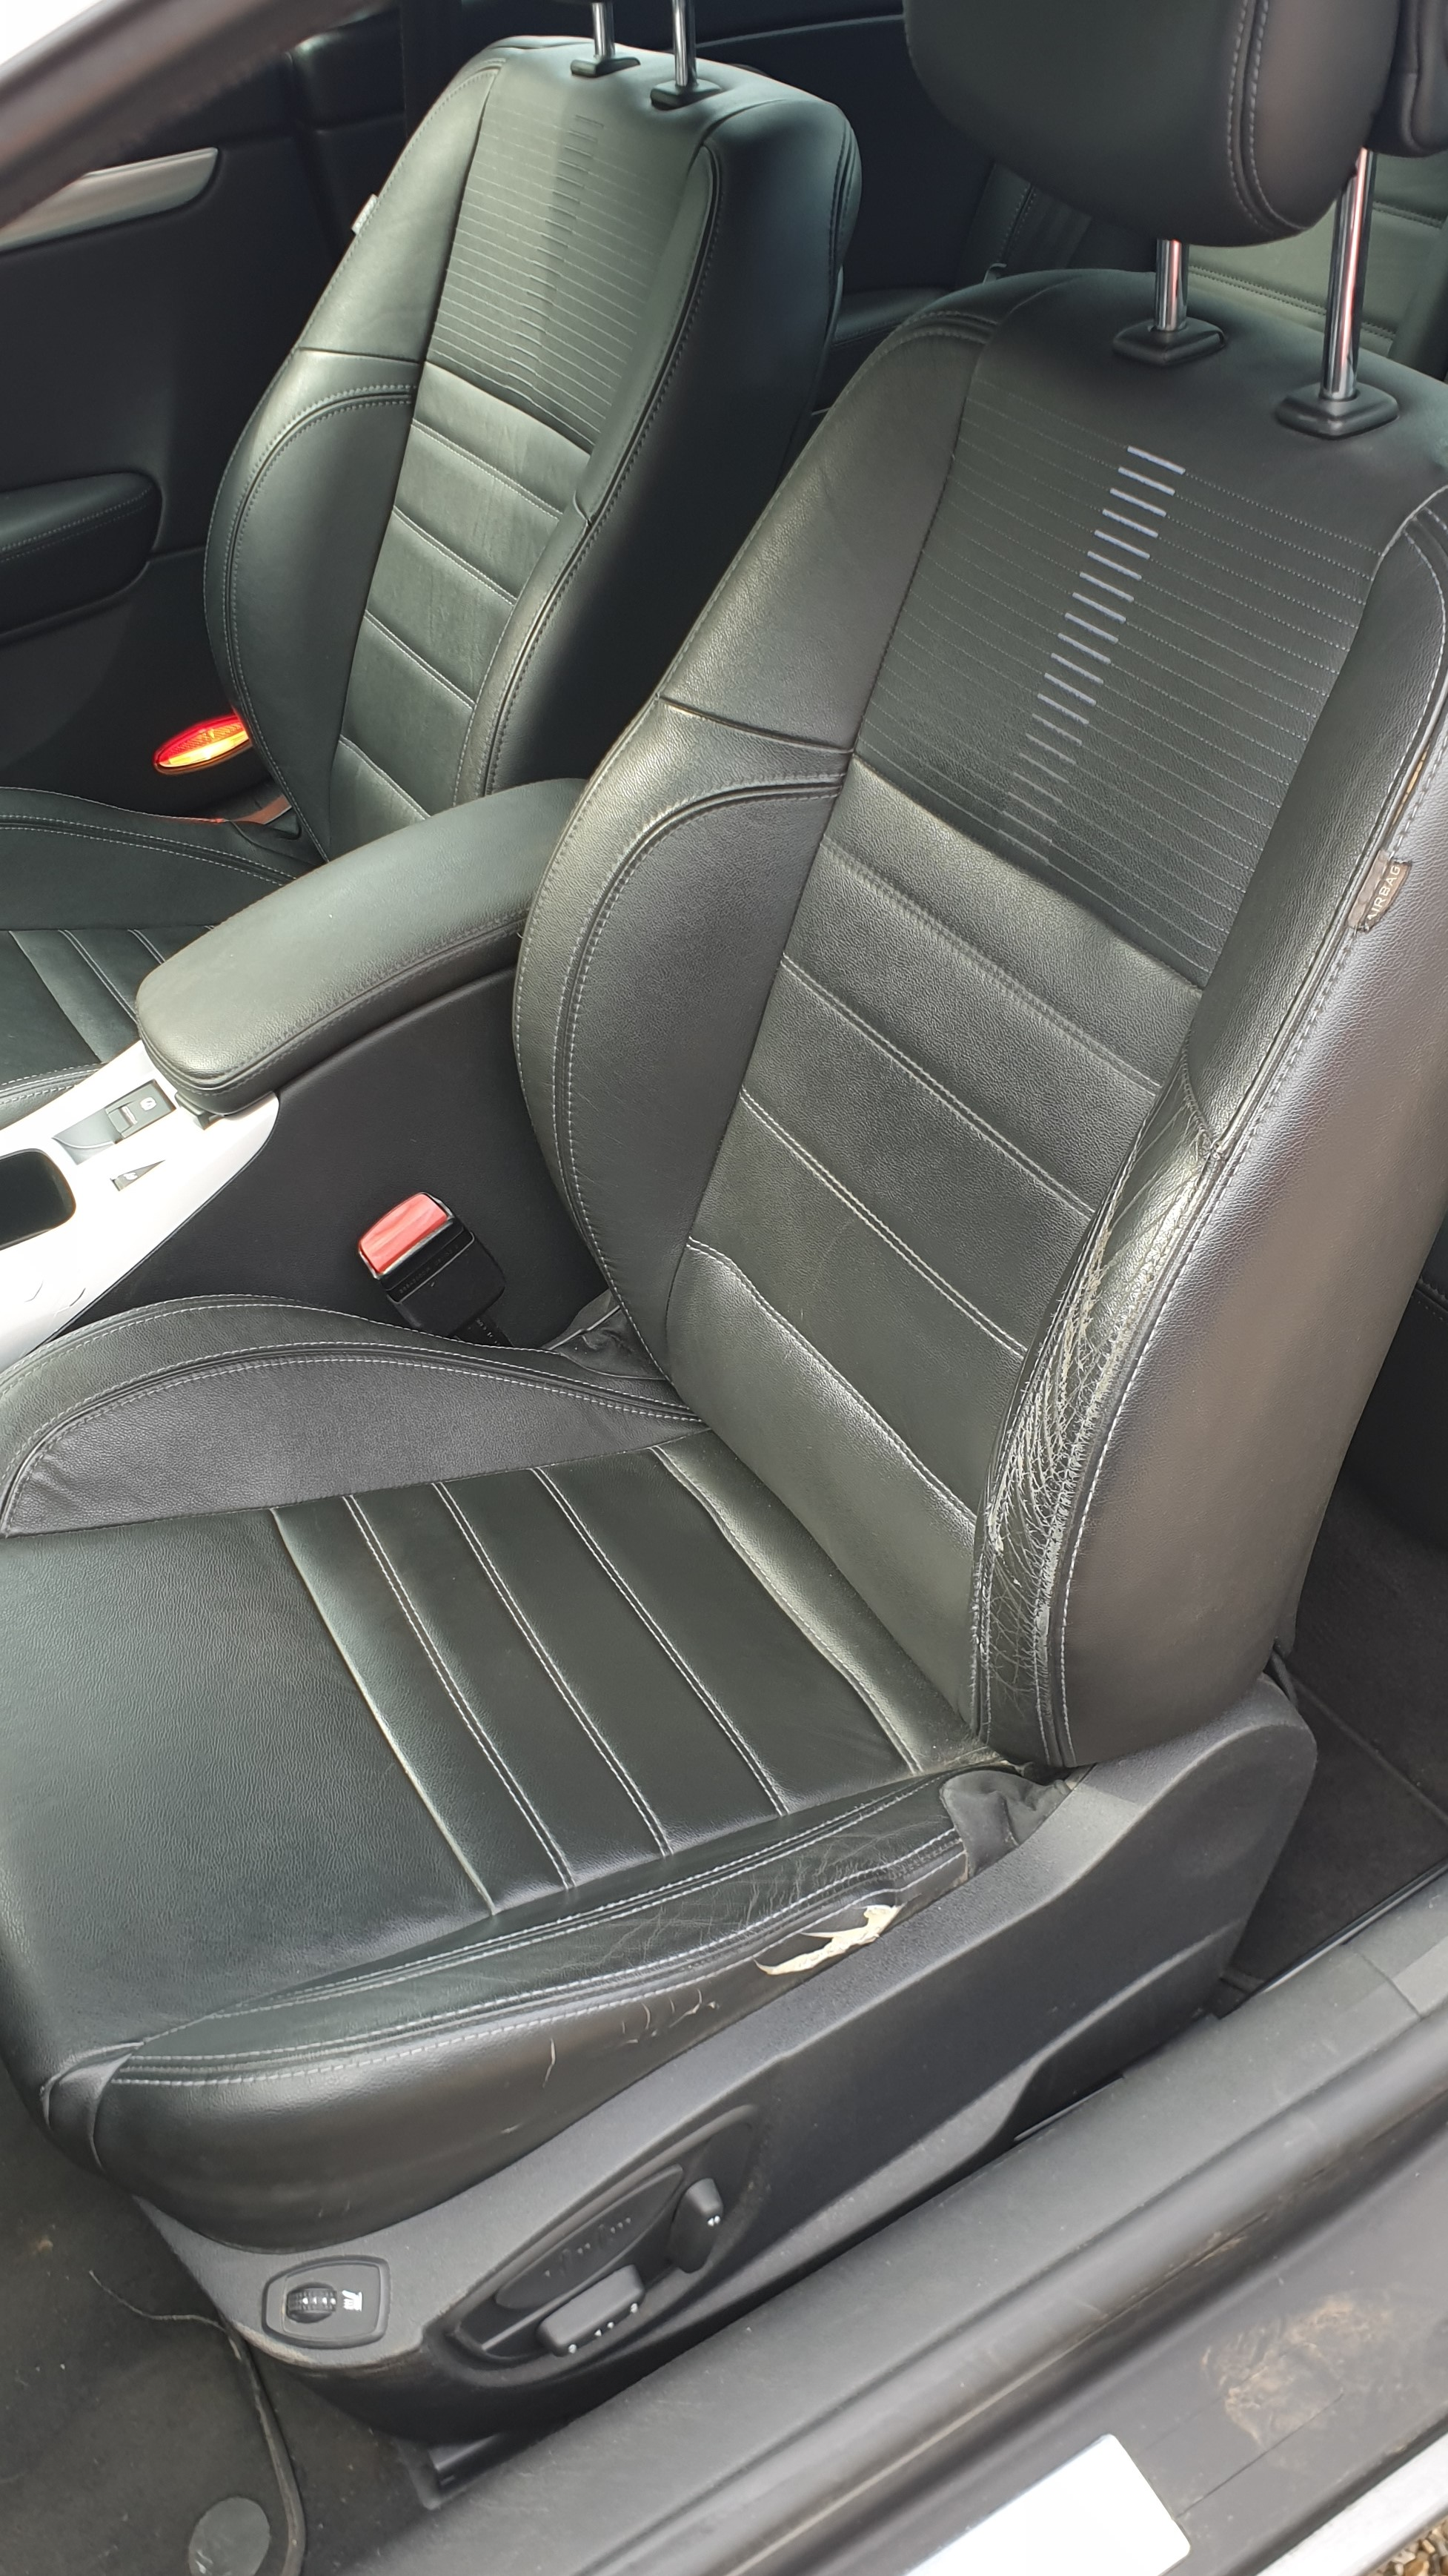 [gaetanXS] Laguna III.1 Coupé 2.0 Turbo GT 205 - Page 3 20082101302524098716976207